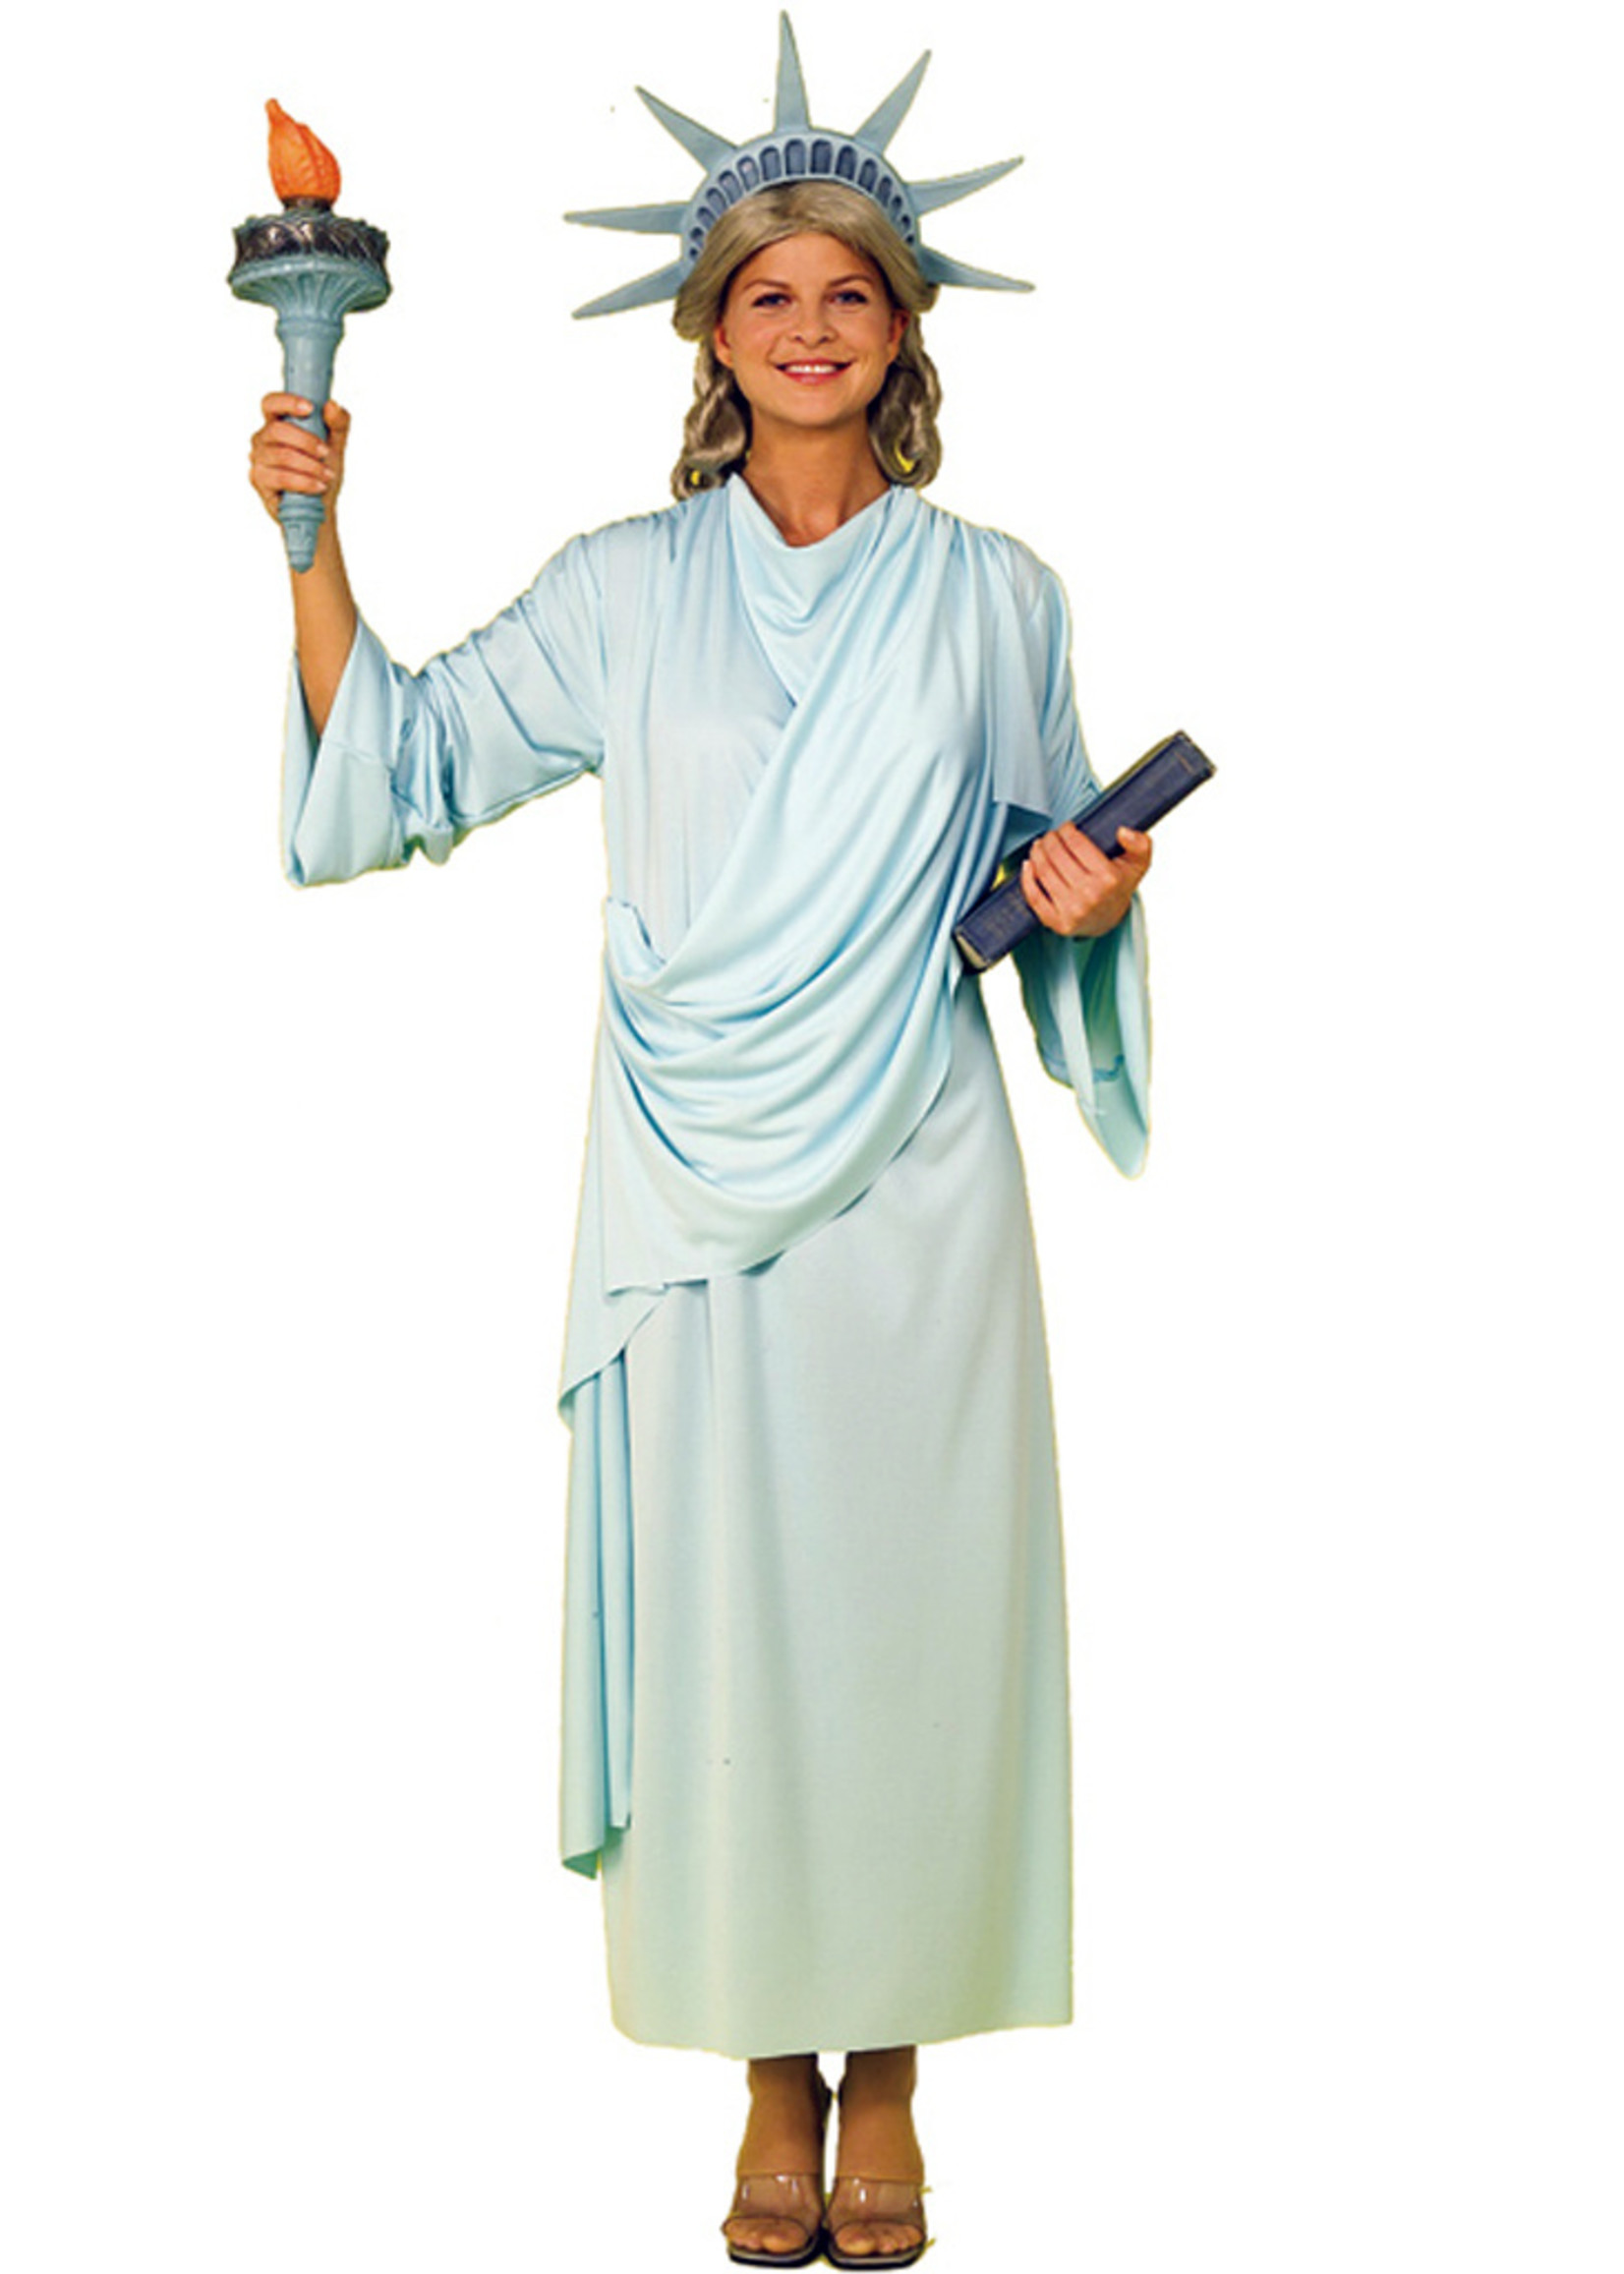 Miss Liberty Costume - Women's